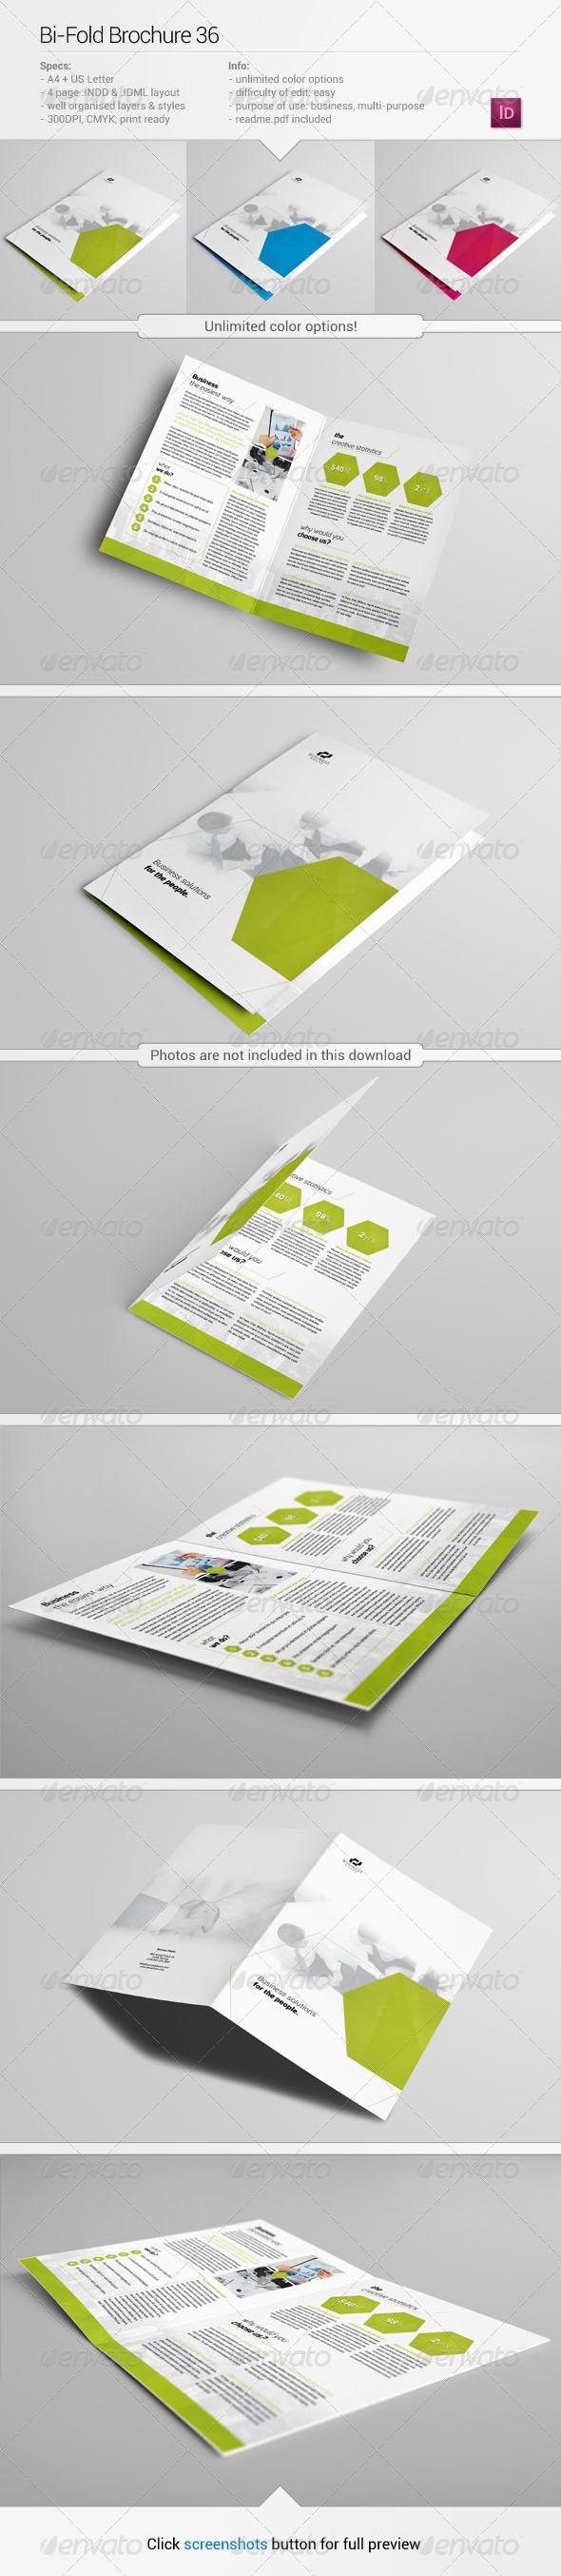 Bi-Fold Brochure 36 - Corporate Brochures